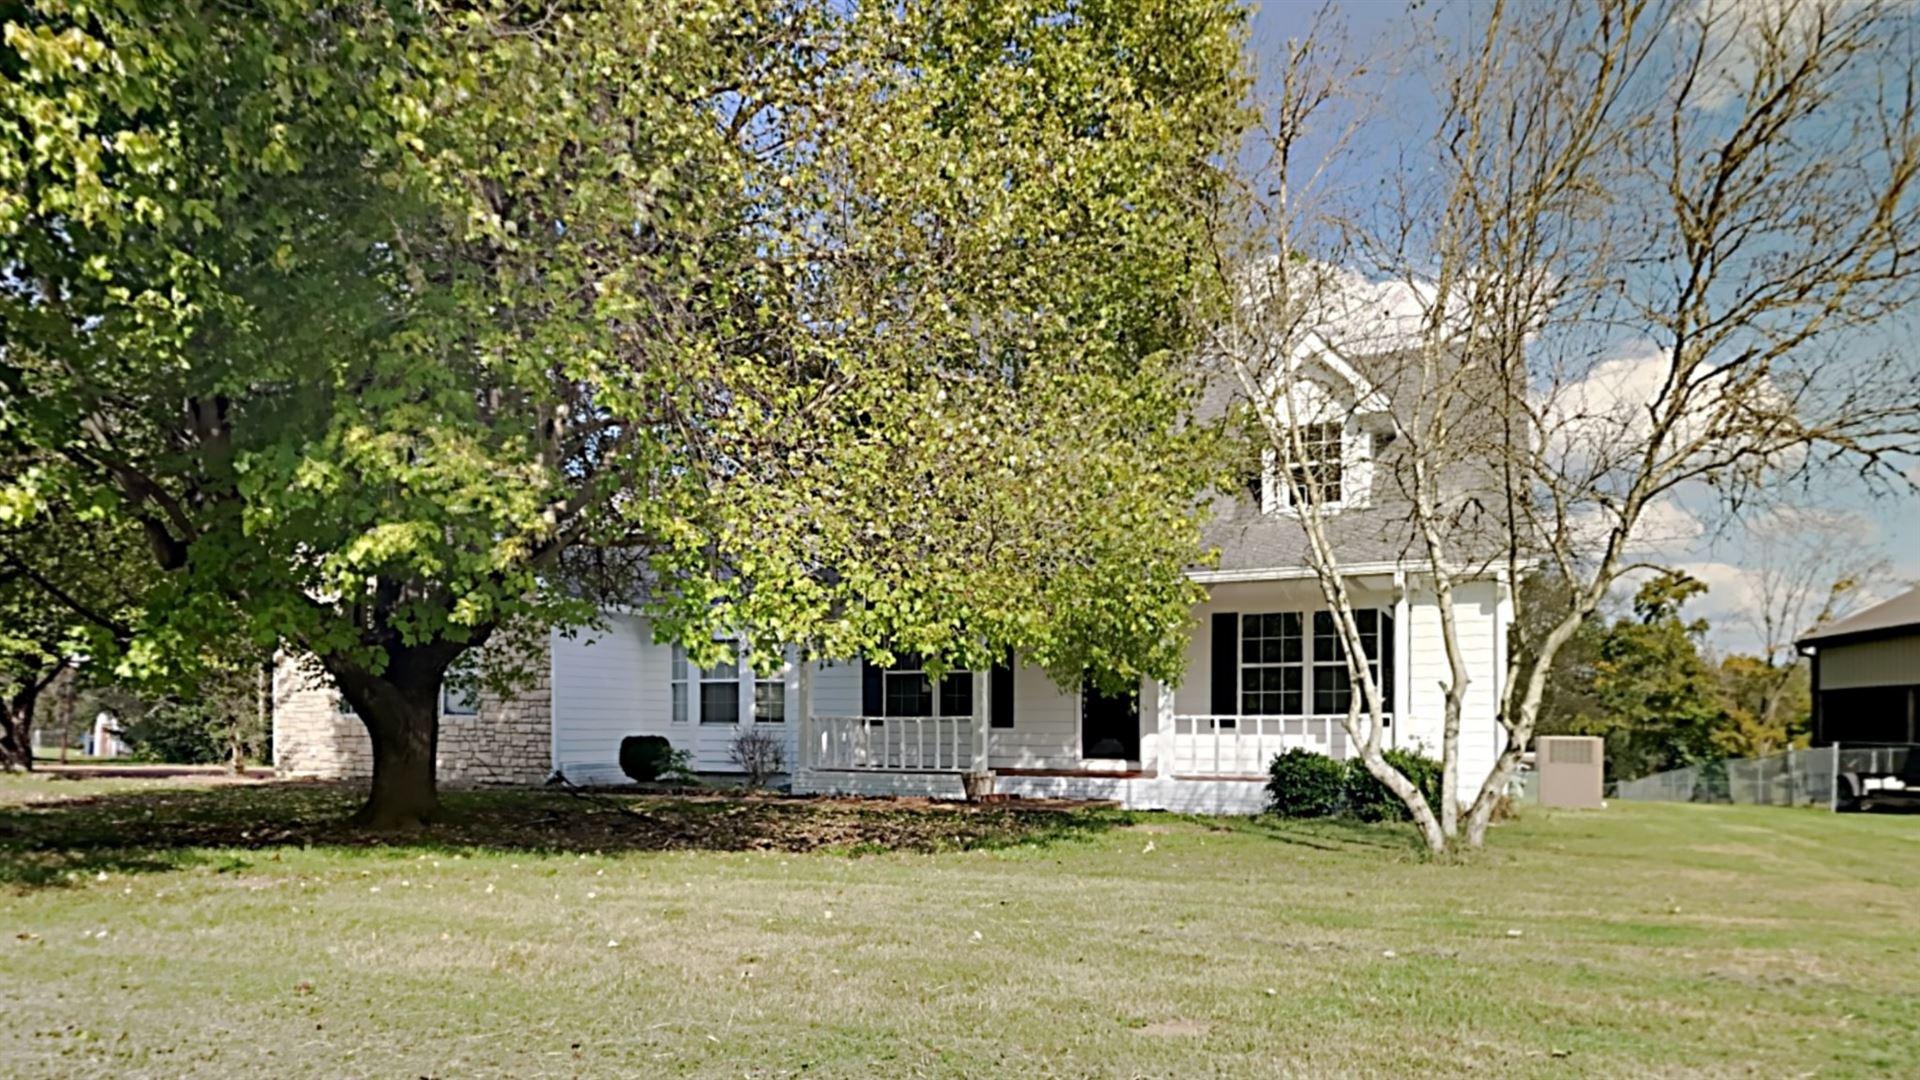 405 Brookridge Dr, Gallatin, TN 37066 - MLS#: 2301470